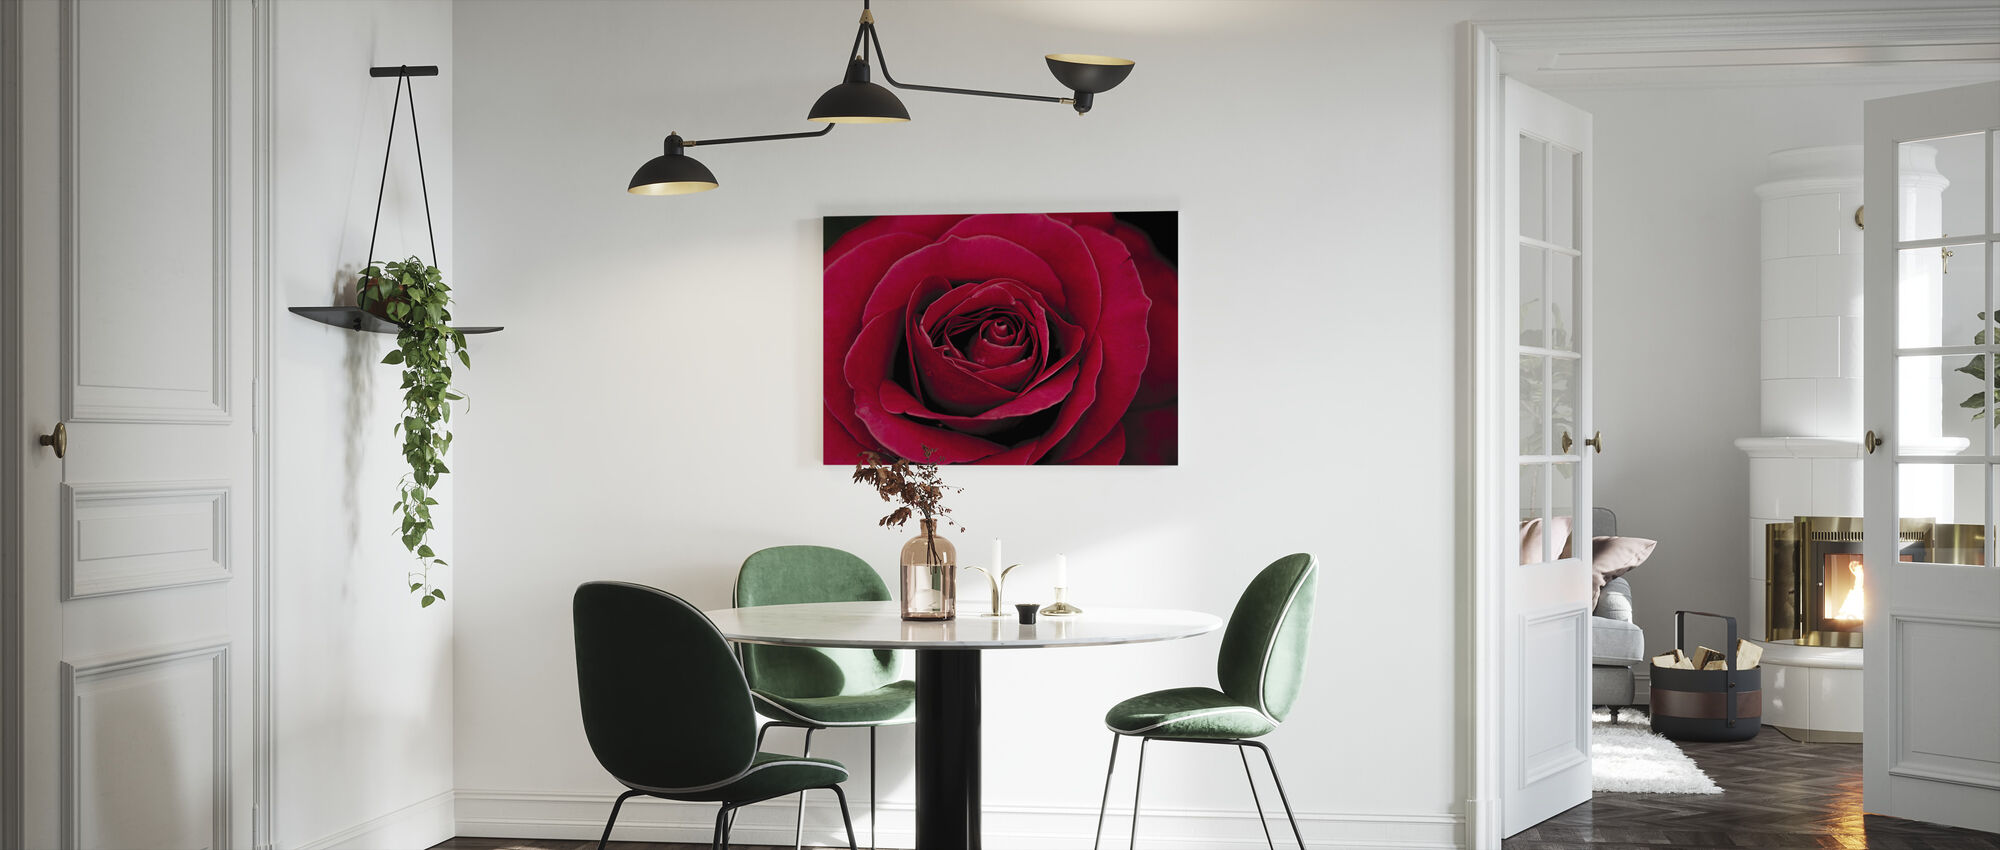 Red Rose - Canvas print - Kitchen